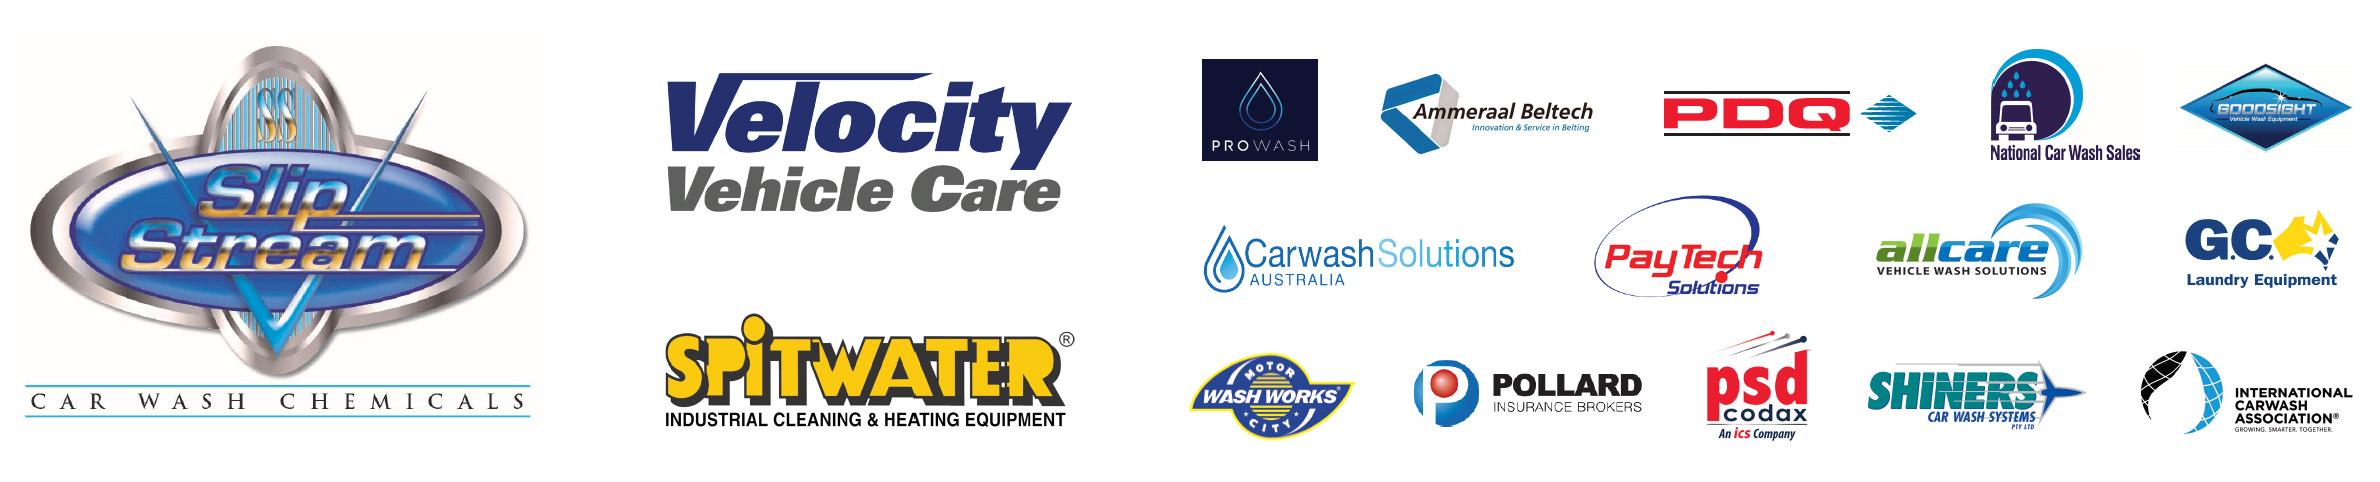 sponsors_logos